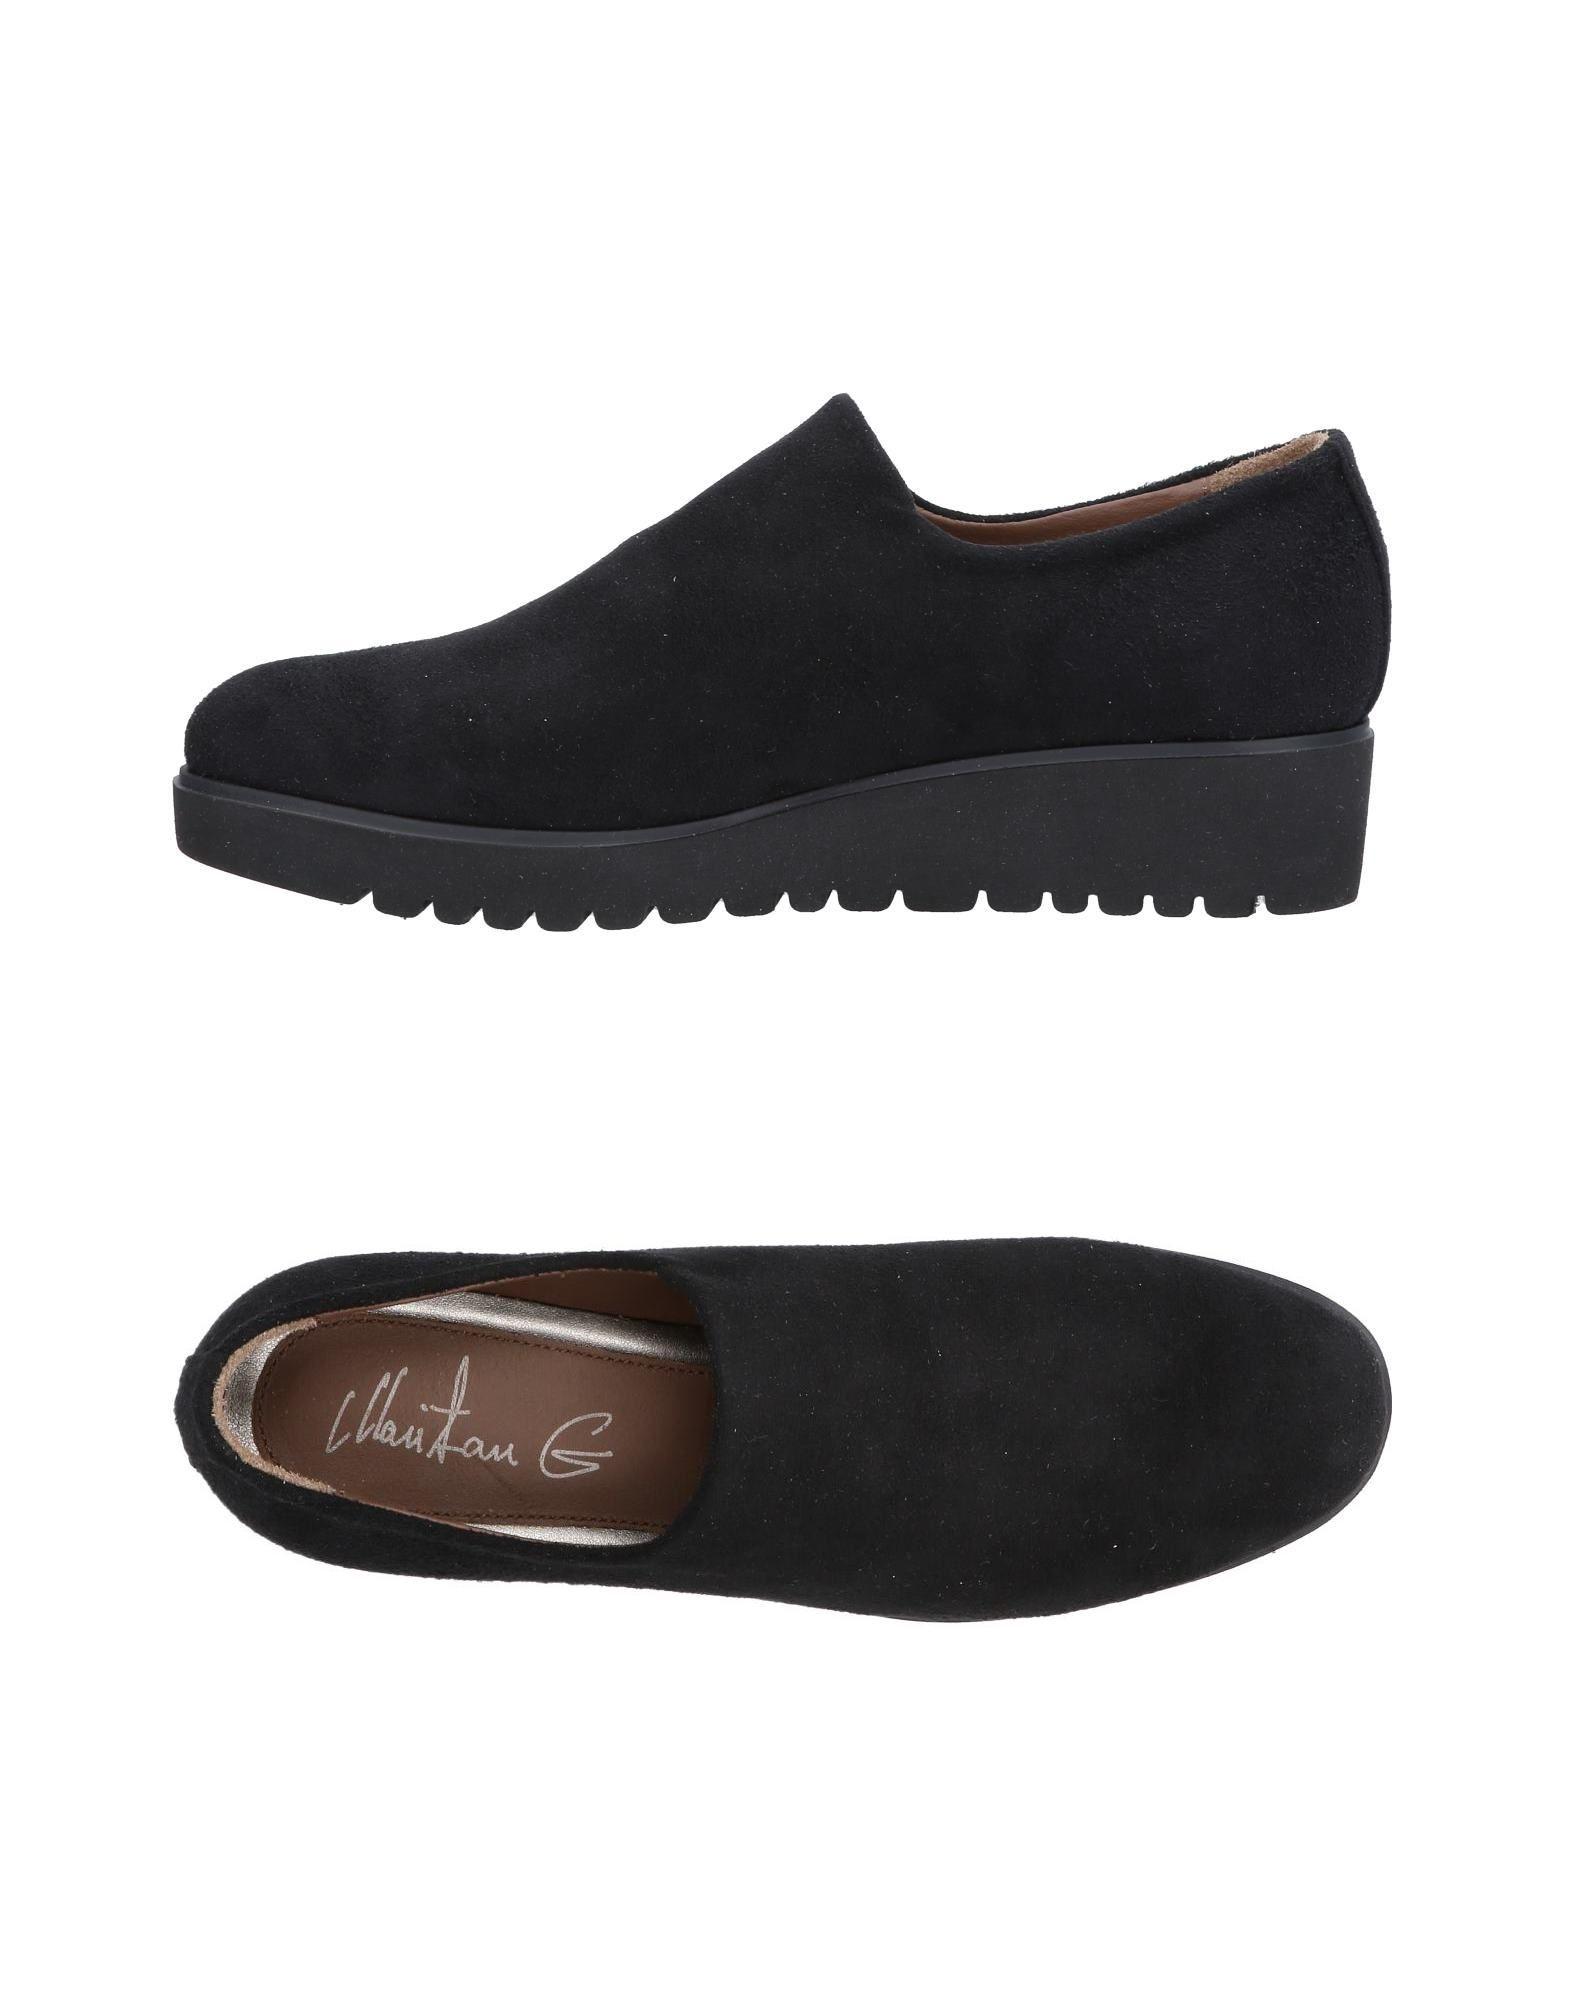 Sandali Fitflop Donna - 11508976CB comode Nuove offerte e scarpe comode 11508976CB a8627b